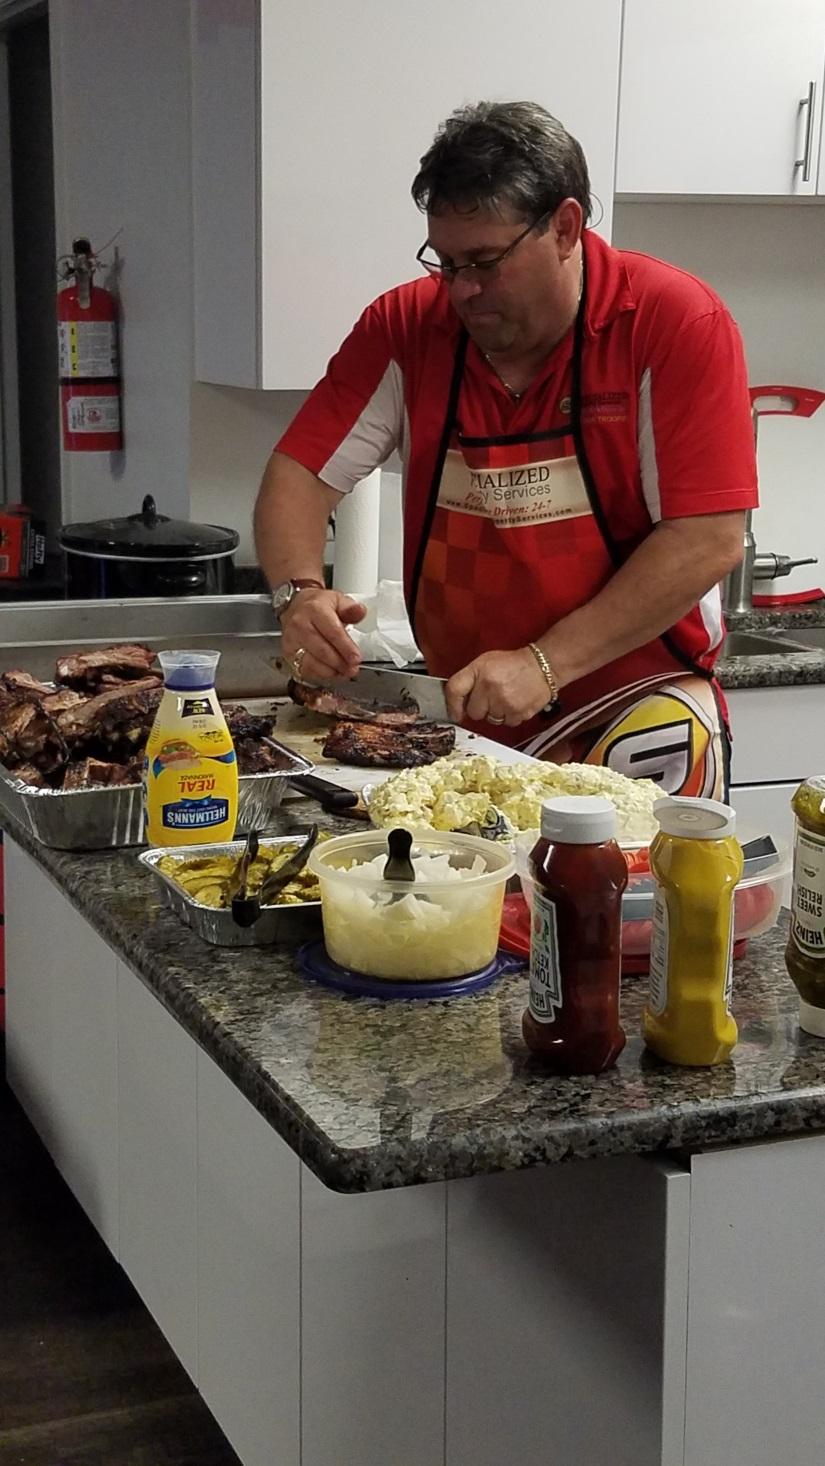 Sean Carney, Master Chef